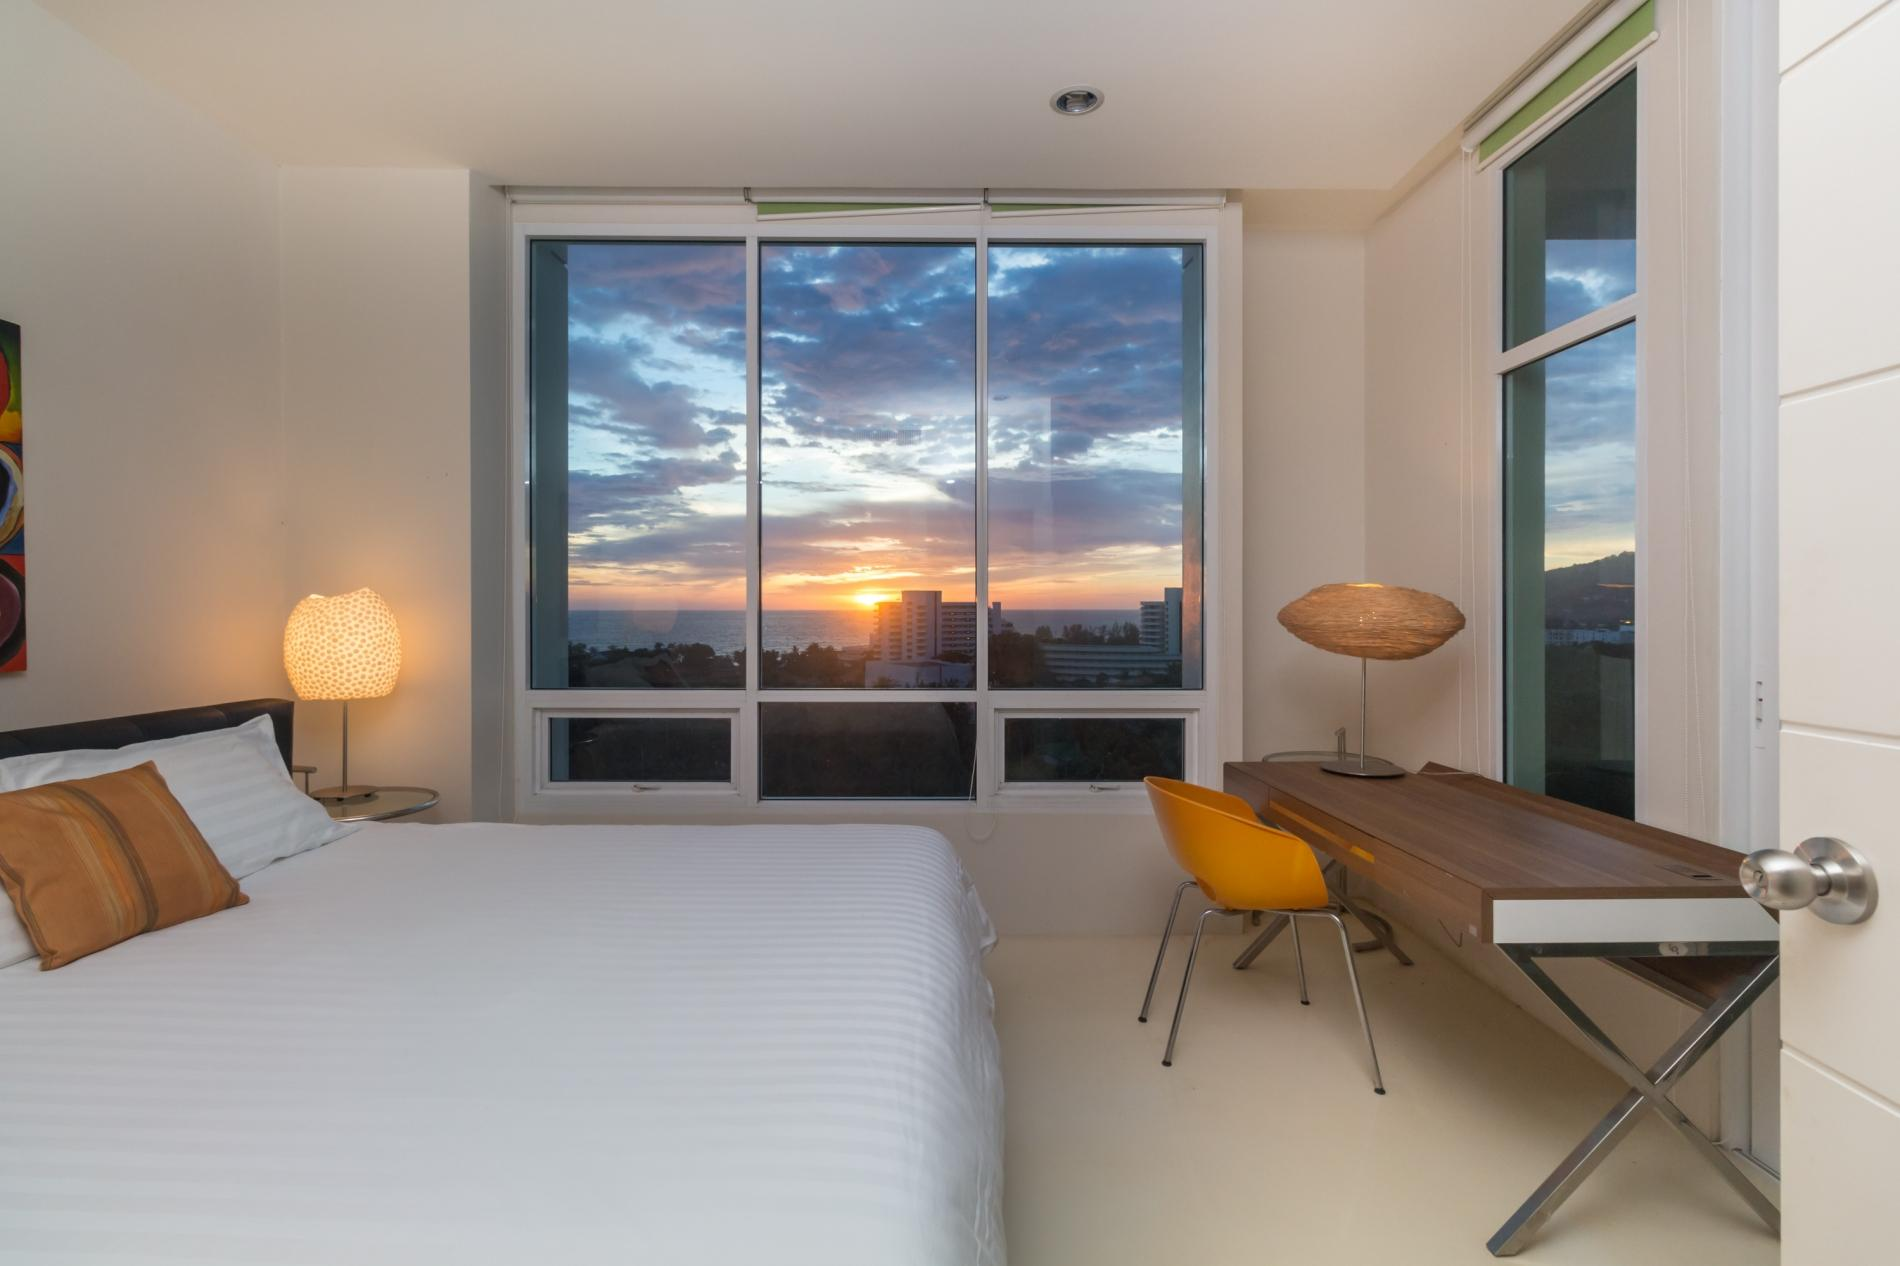 Apartment KH2605 - Sea-view Penthouse in Karon  walk to beach  restaurants  bars  shops photo 18647924